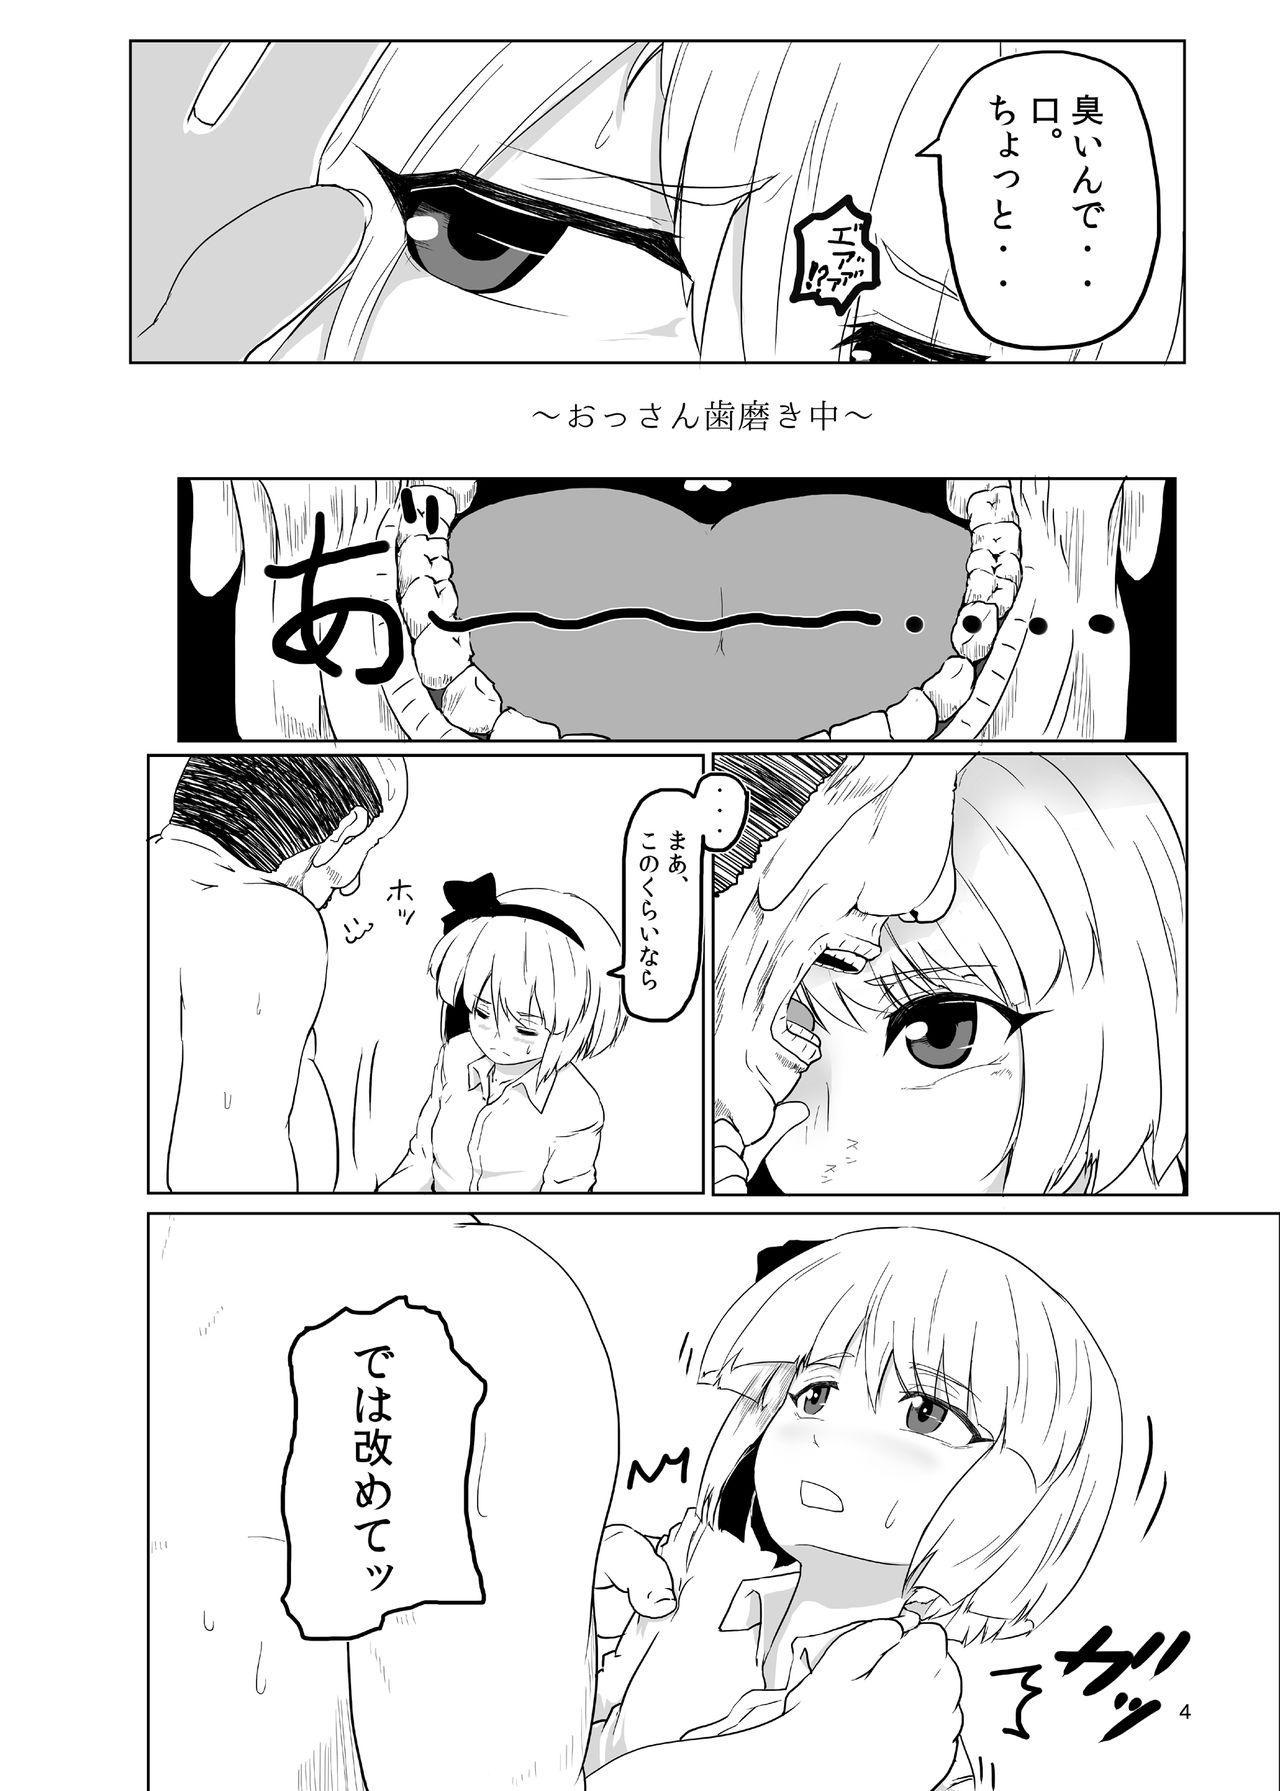 [Hayaku Byouin e Itte Kudasai. (Byoin)] Youmu-kun (Juuyou) ni Shabutte Moraitai. (Touhou Project) [Digital] 4